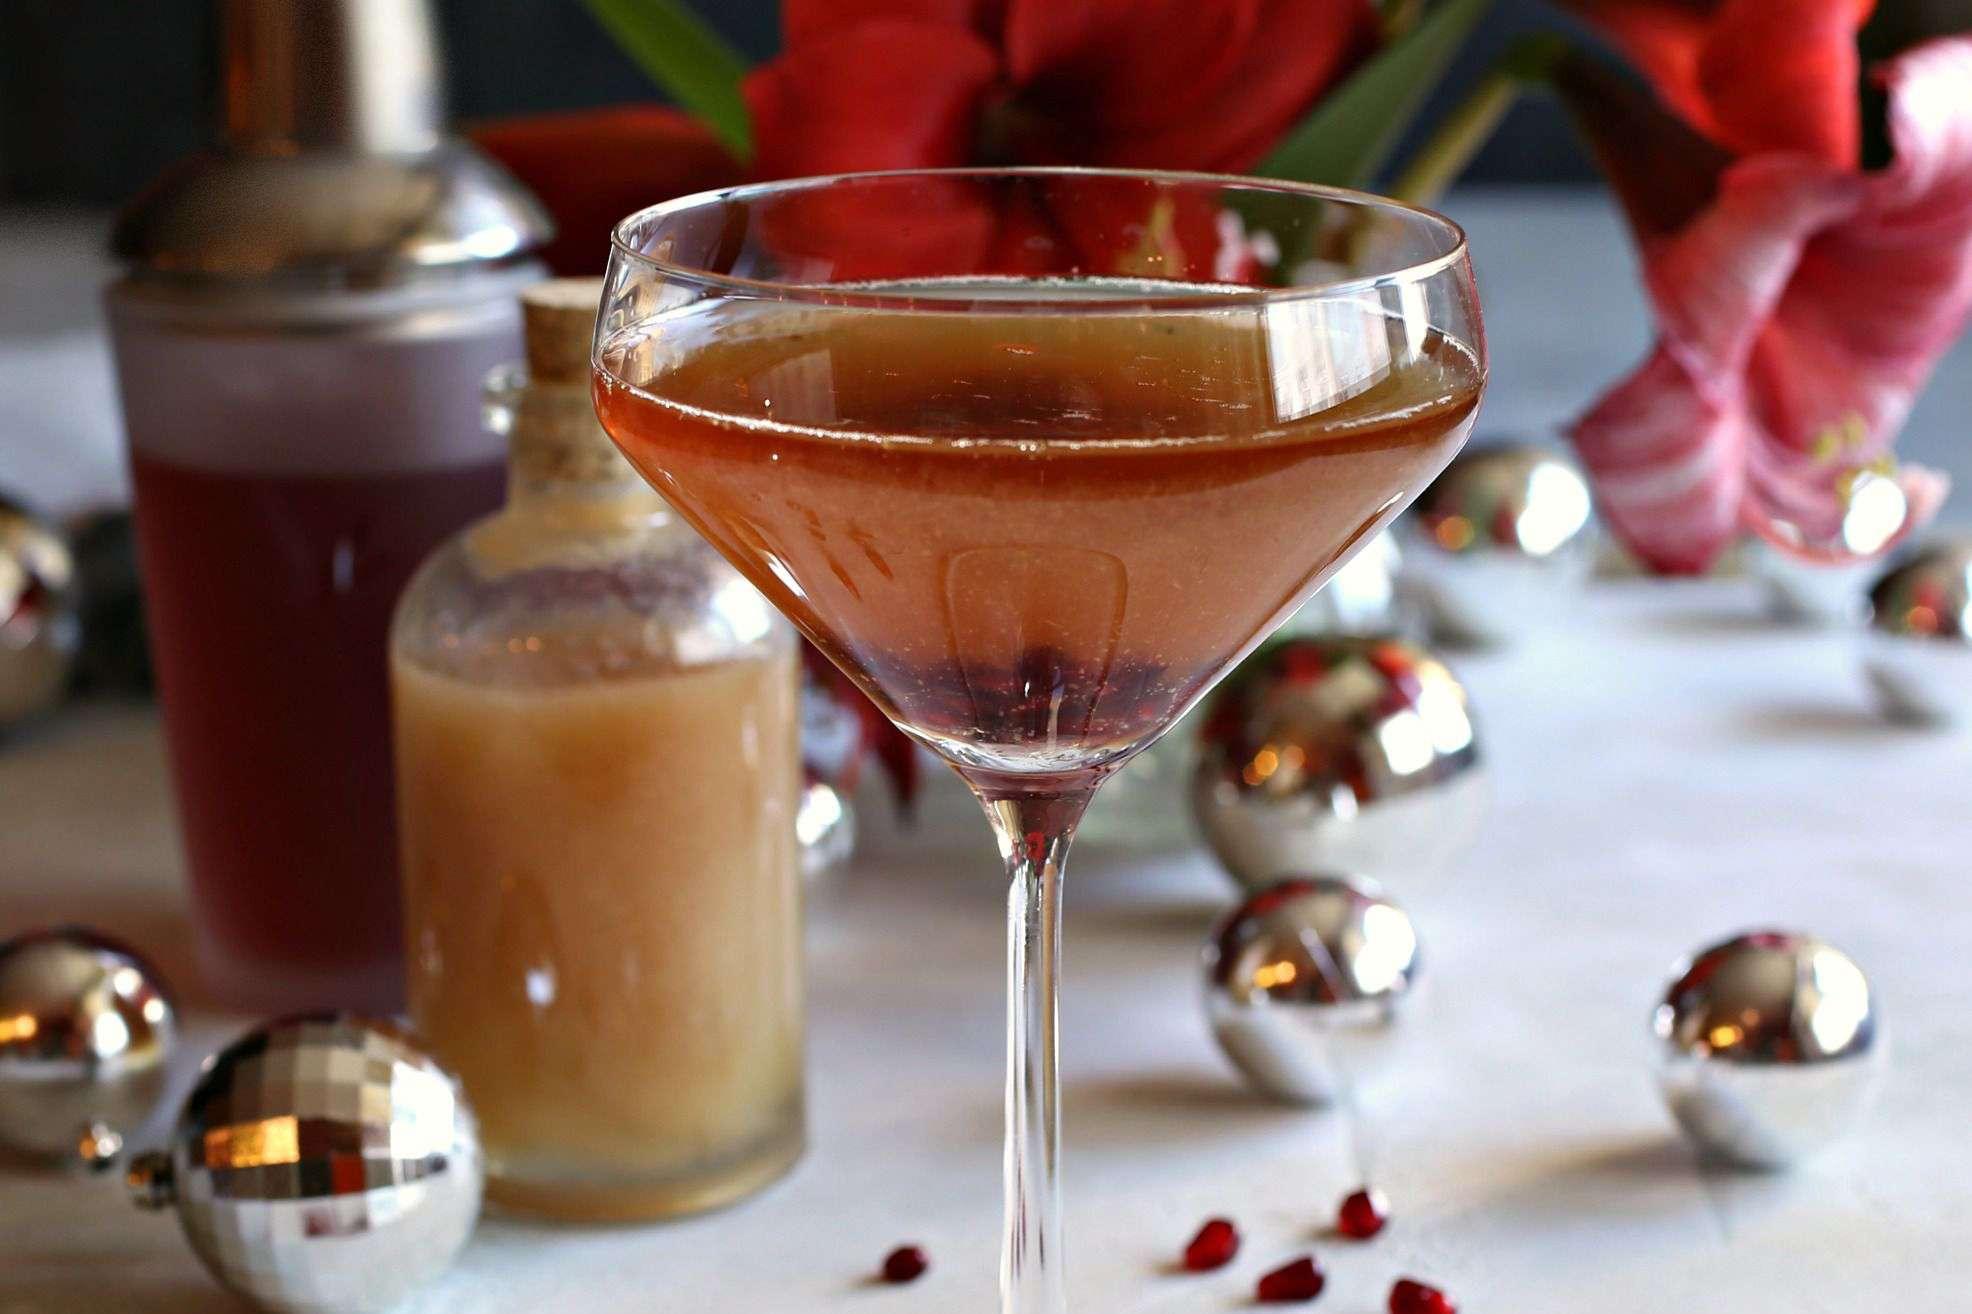 Pear and Pomegranate Champagne Shrub